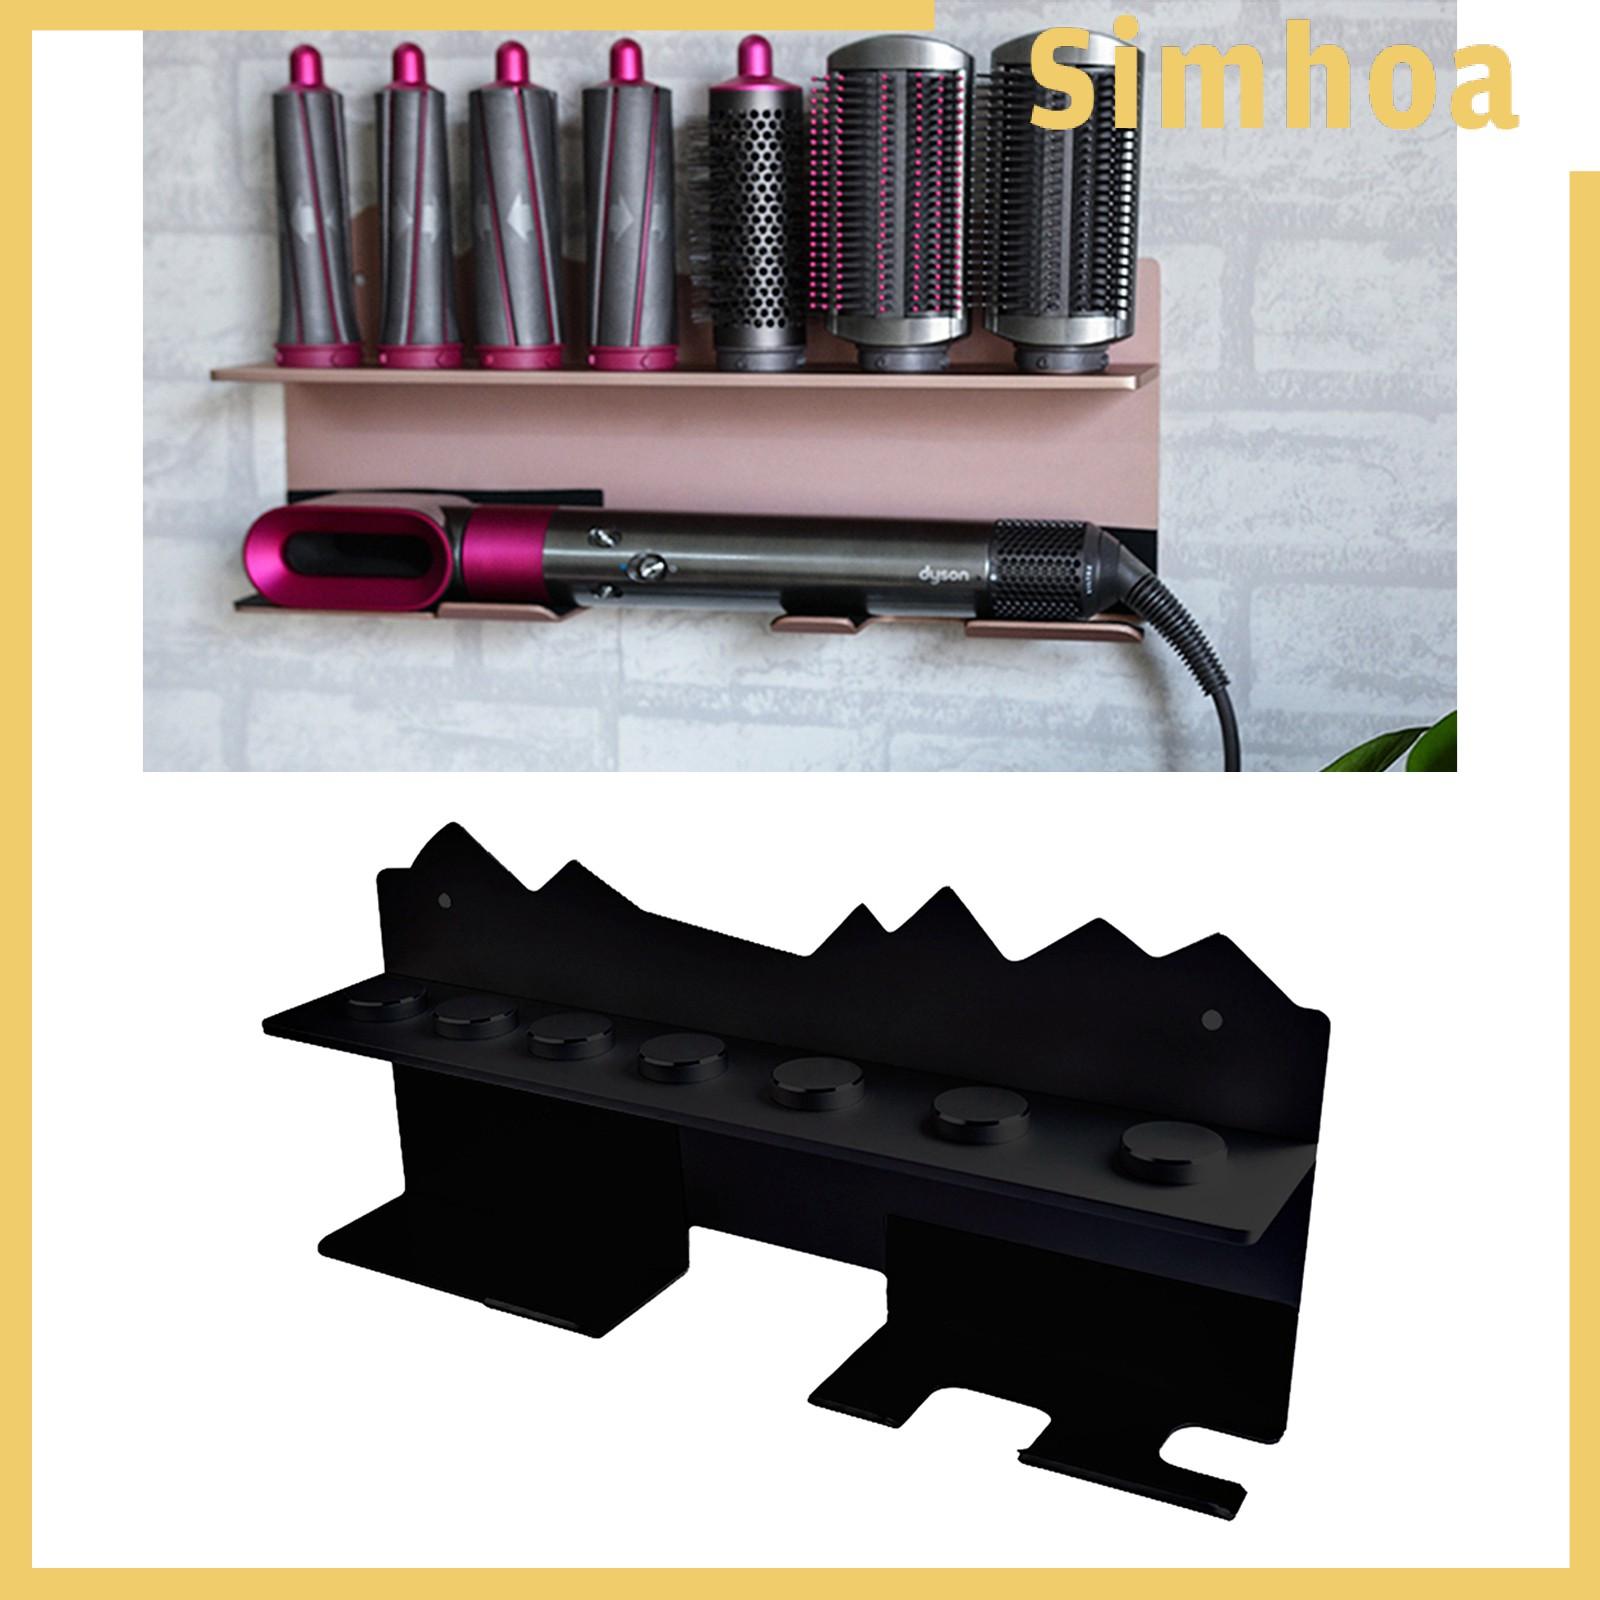 DYSON [Simhoa] 戴森空氣包裹造型器的鋁合金捲翹棒壁掛式支架